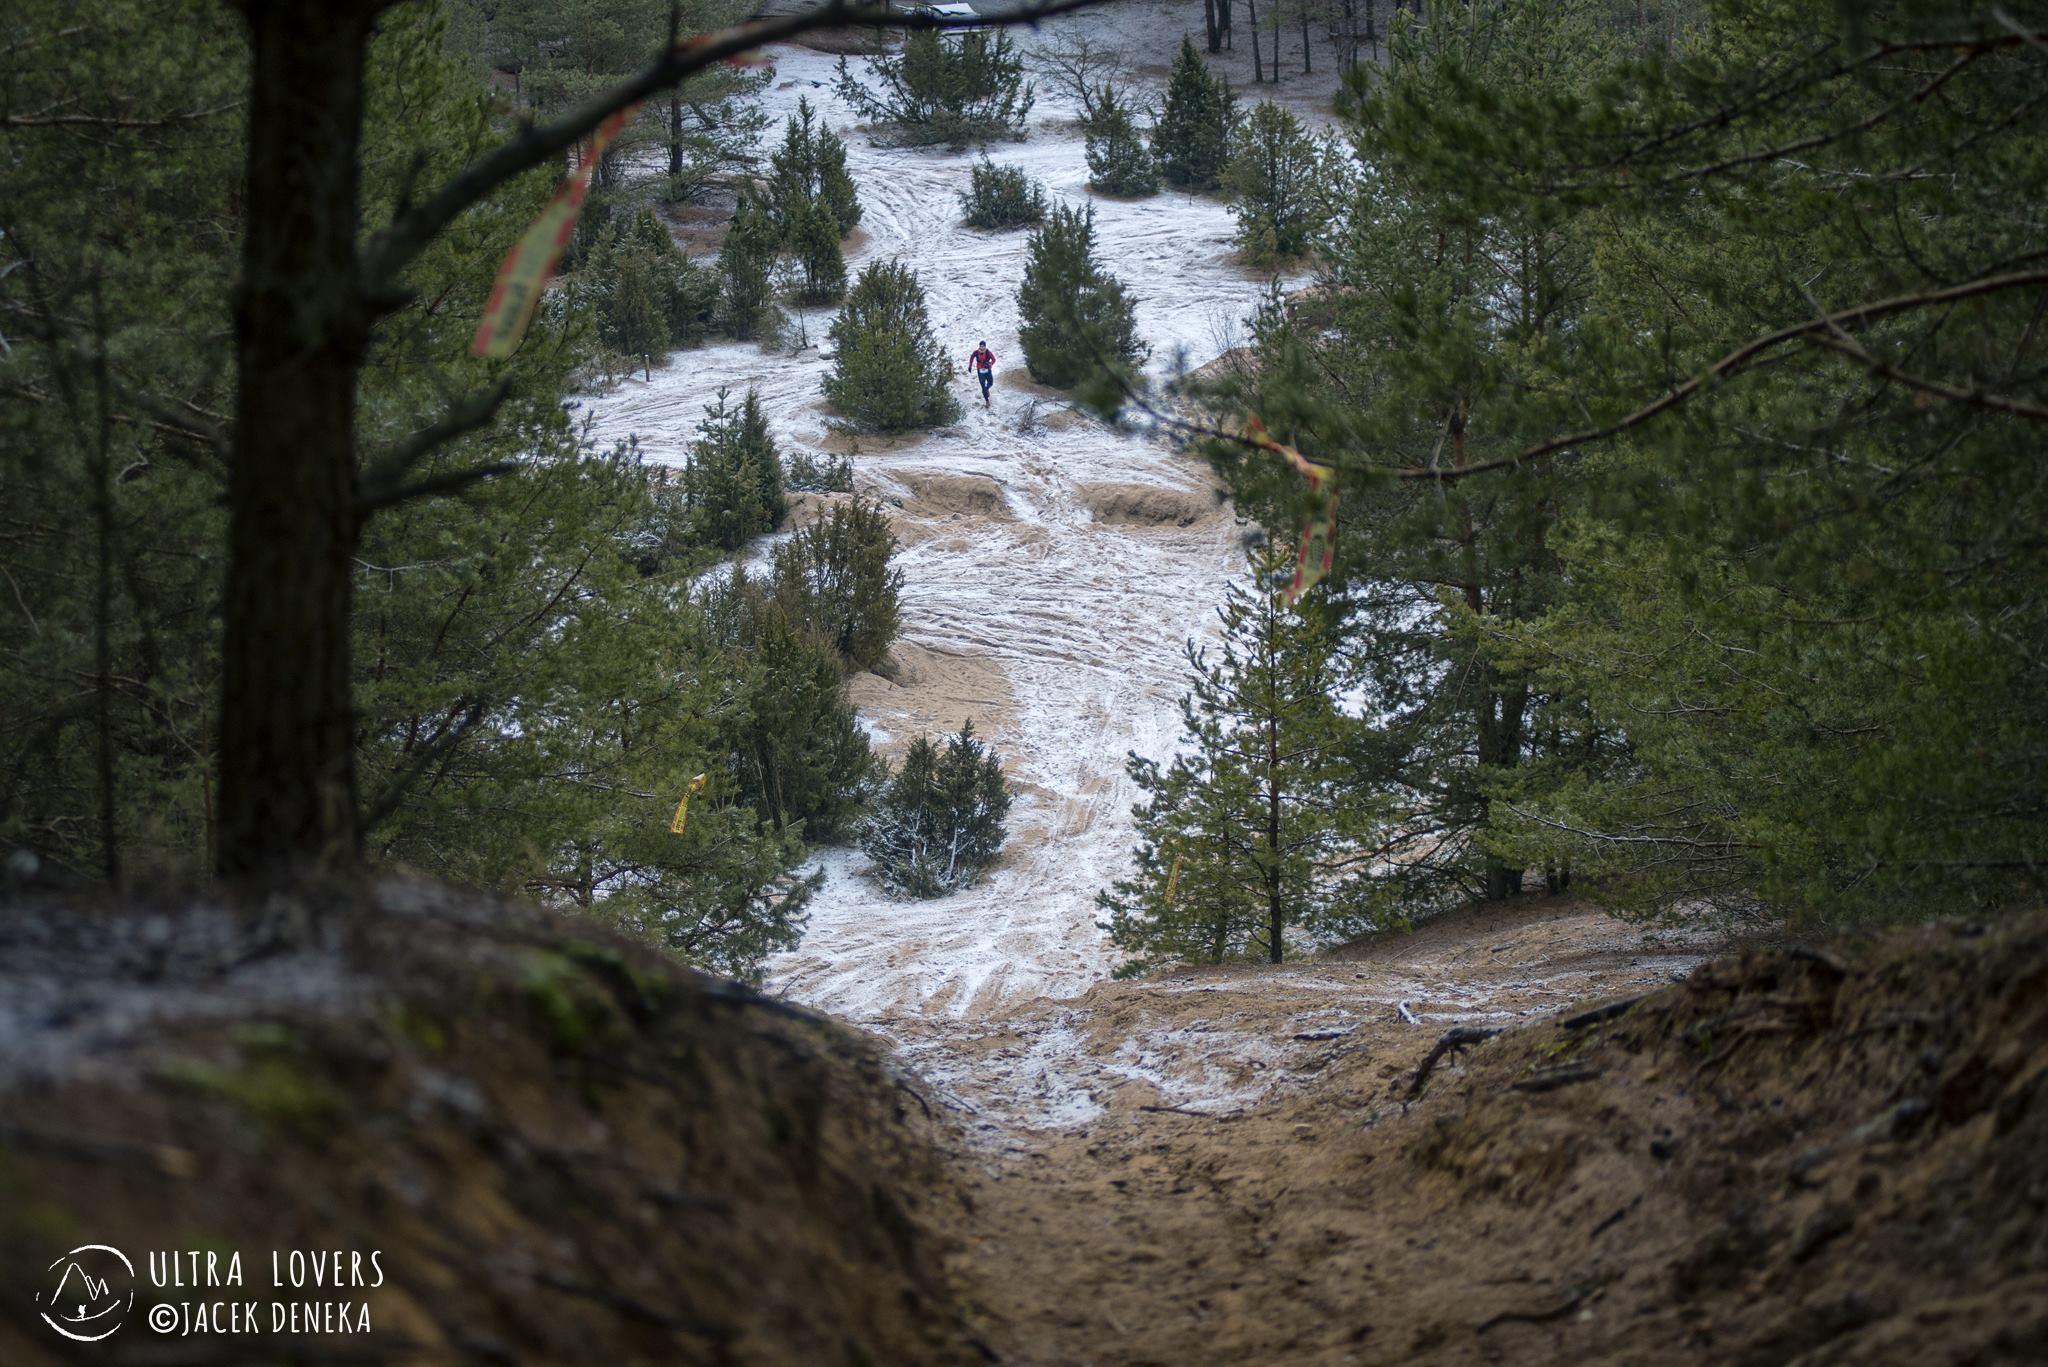 Ultra Śledź Snowpark Ogrodniczki